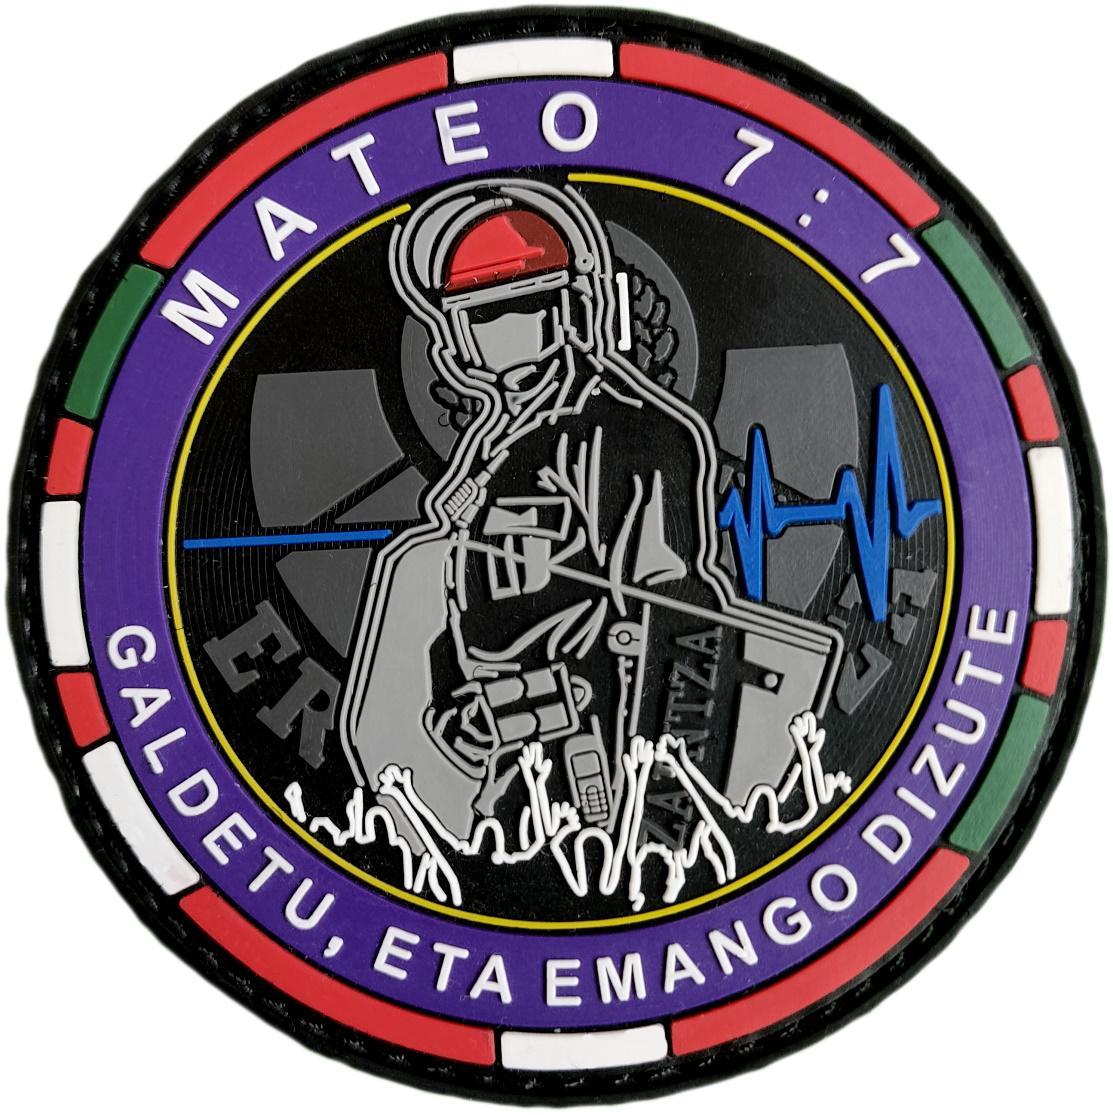 Ertzaintza Euskadi Policía País Vasco Brigada Móvil Mateo 7:7 galdetu eta emango dizute pedid y se os dará parche insignia emblema distintivo